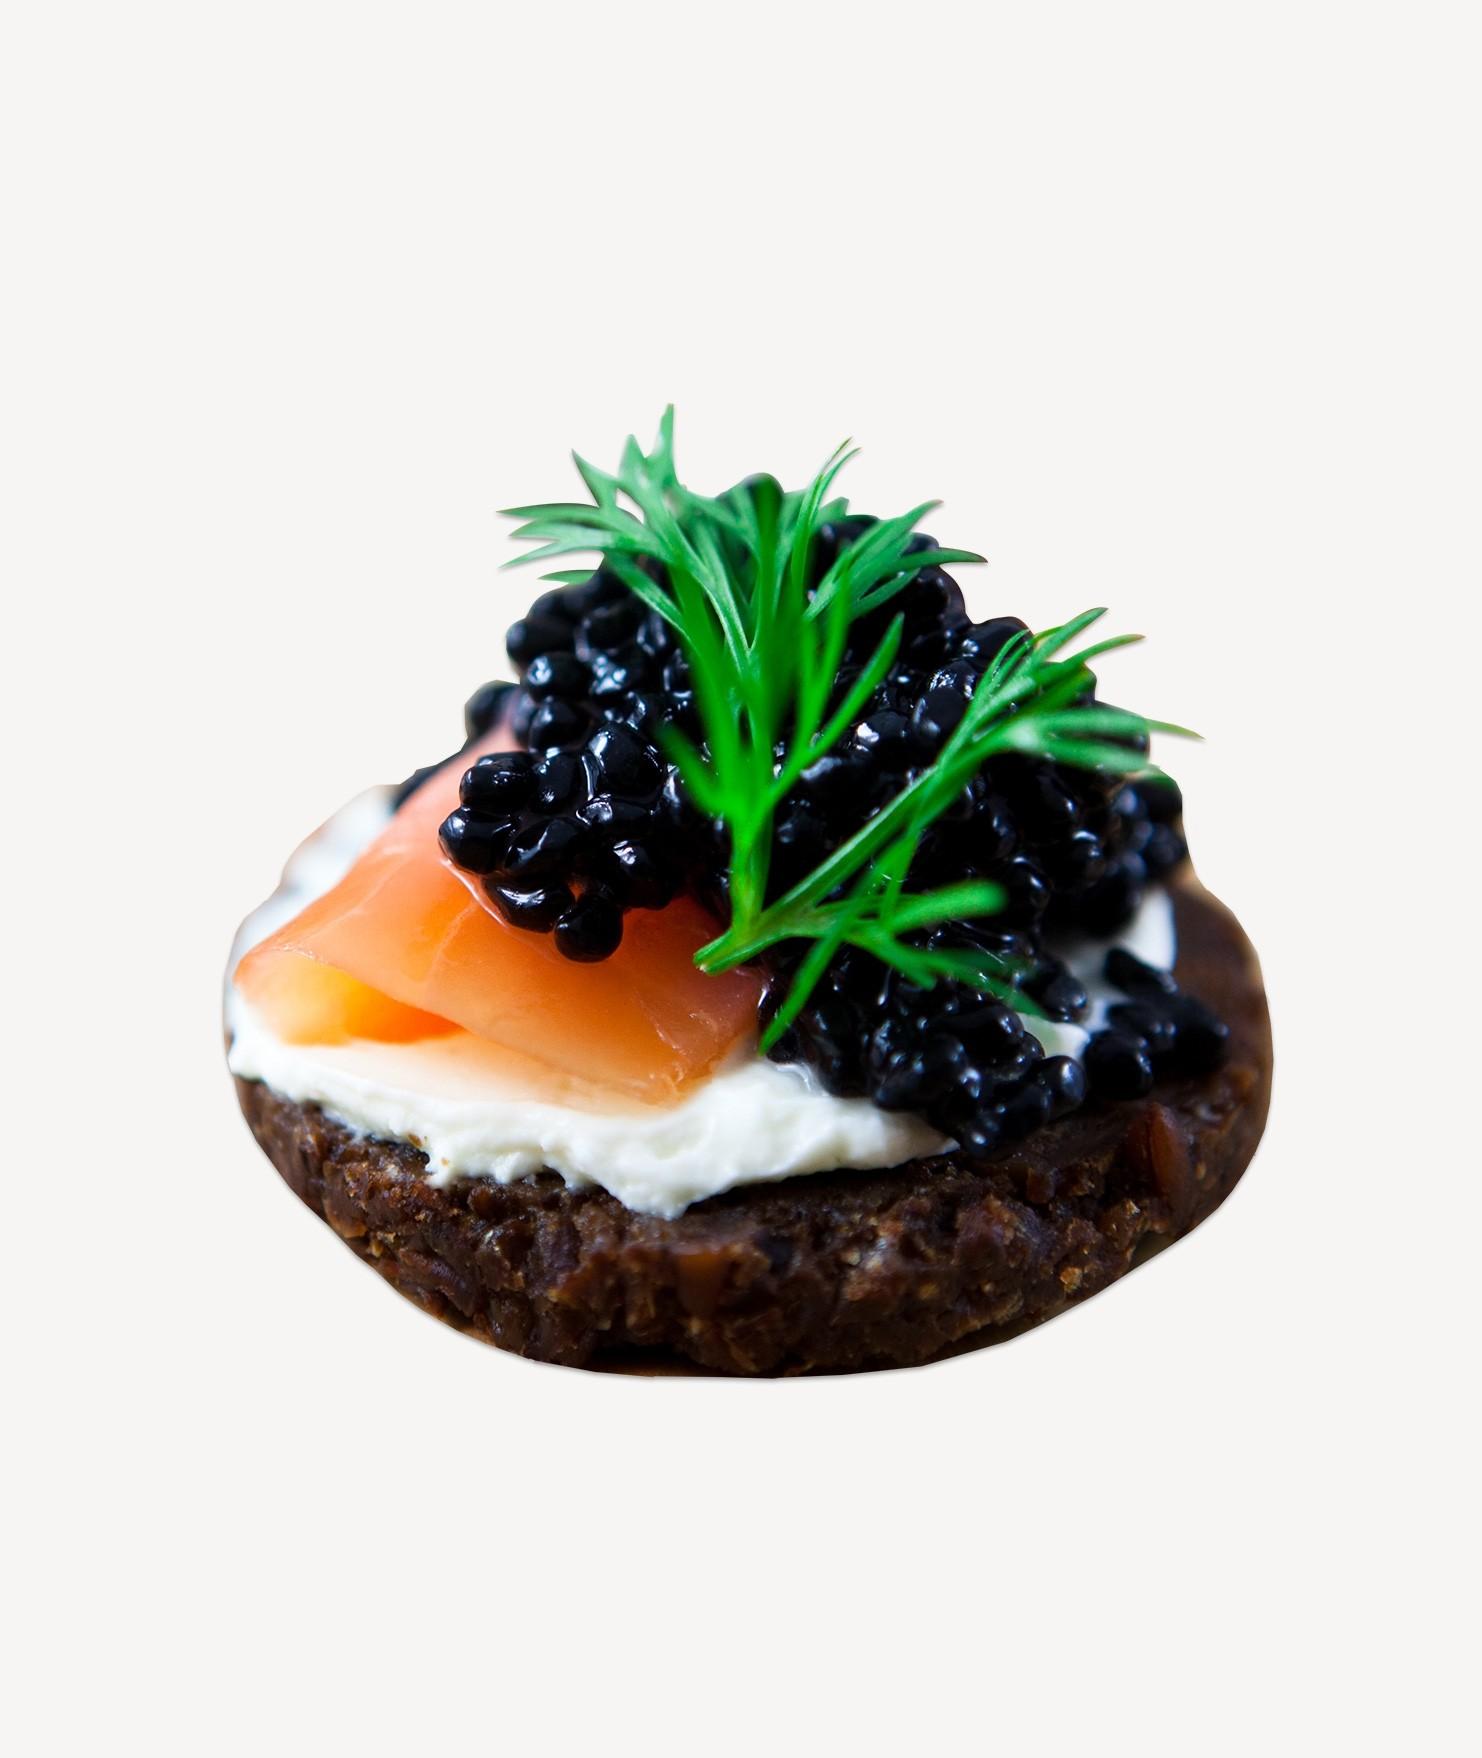 Elegant Caviar & Smoked Salmon Stacked Canapés Photo